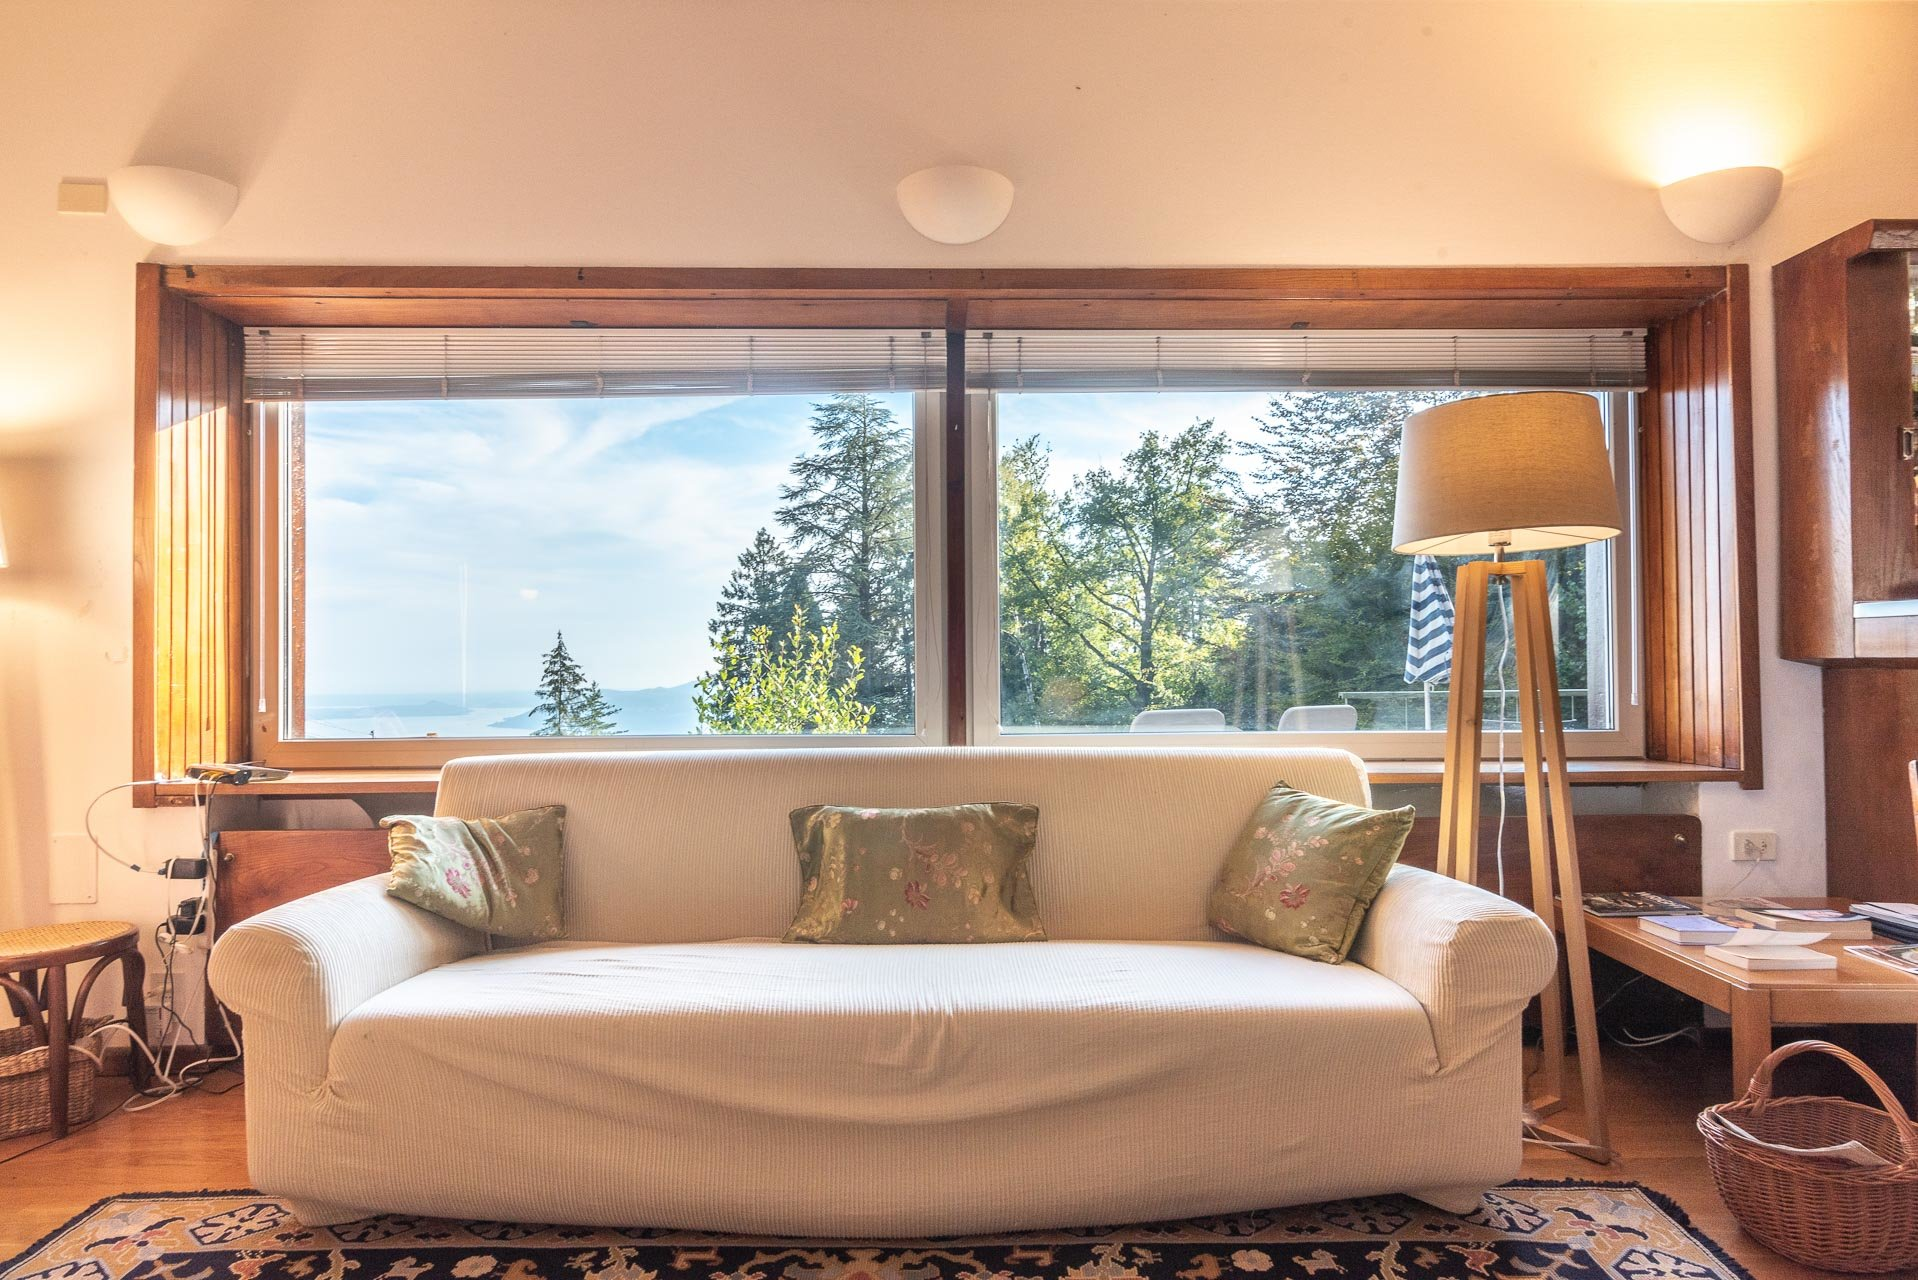 Villa zum Verkauf in Premeno des Bogens. Marco Zanuso